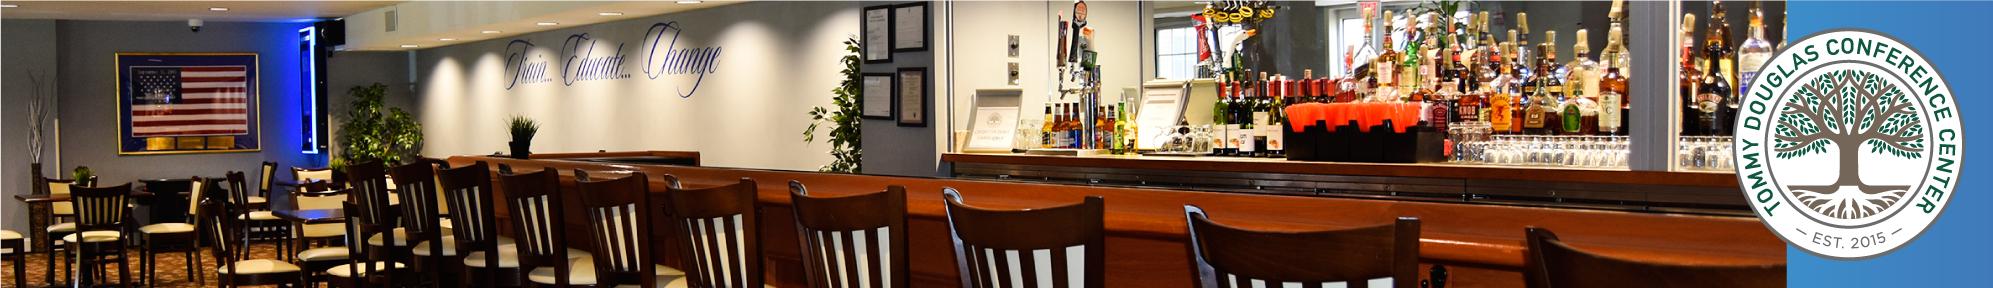 Lounge.page.photo.bar2.jpg